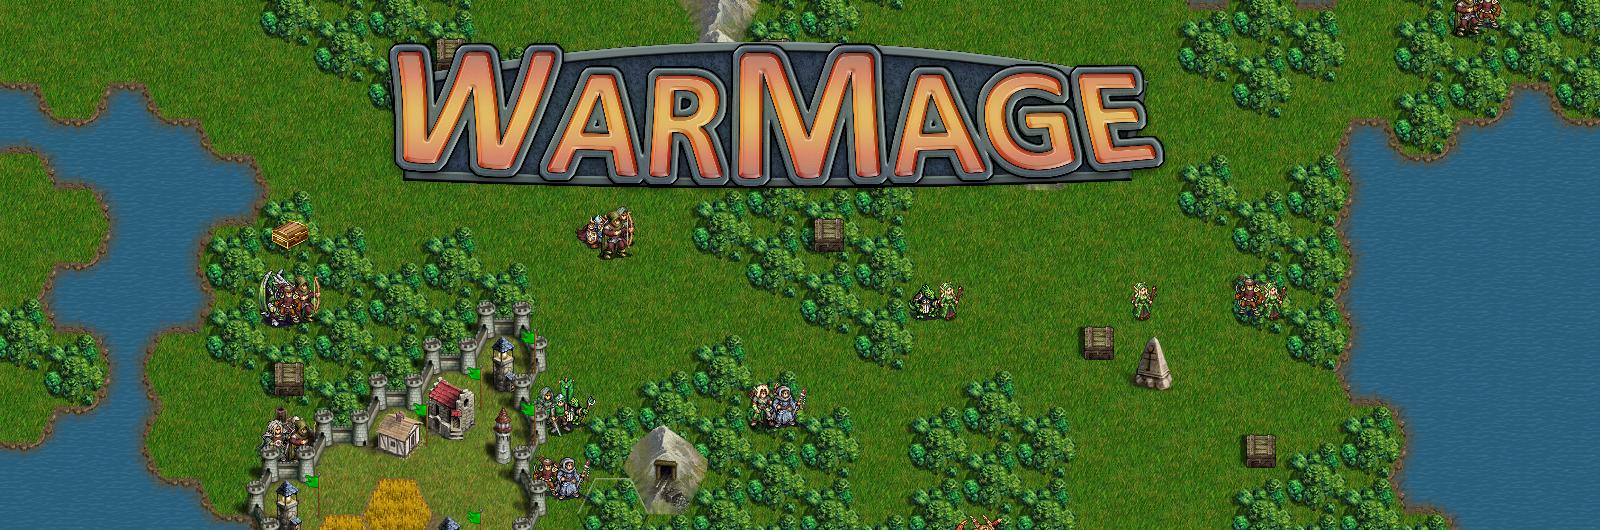 WarMage